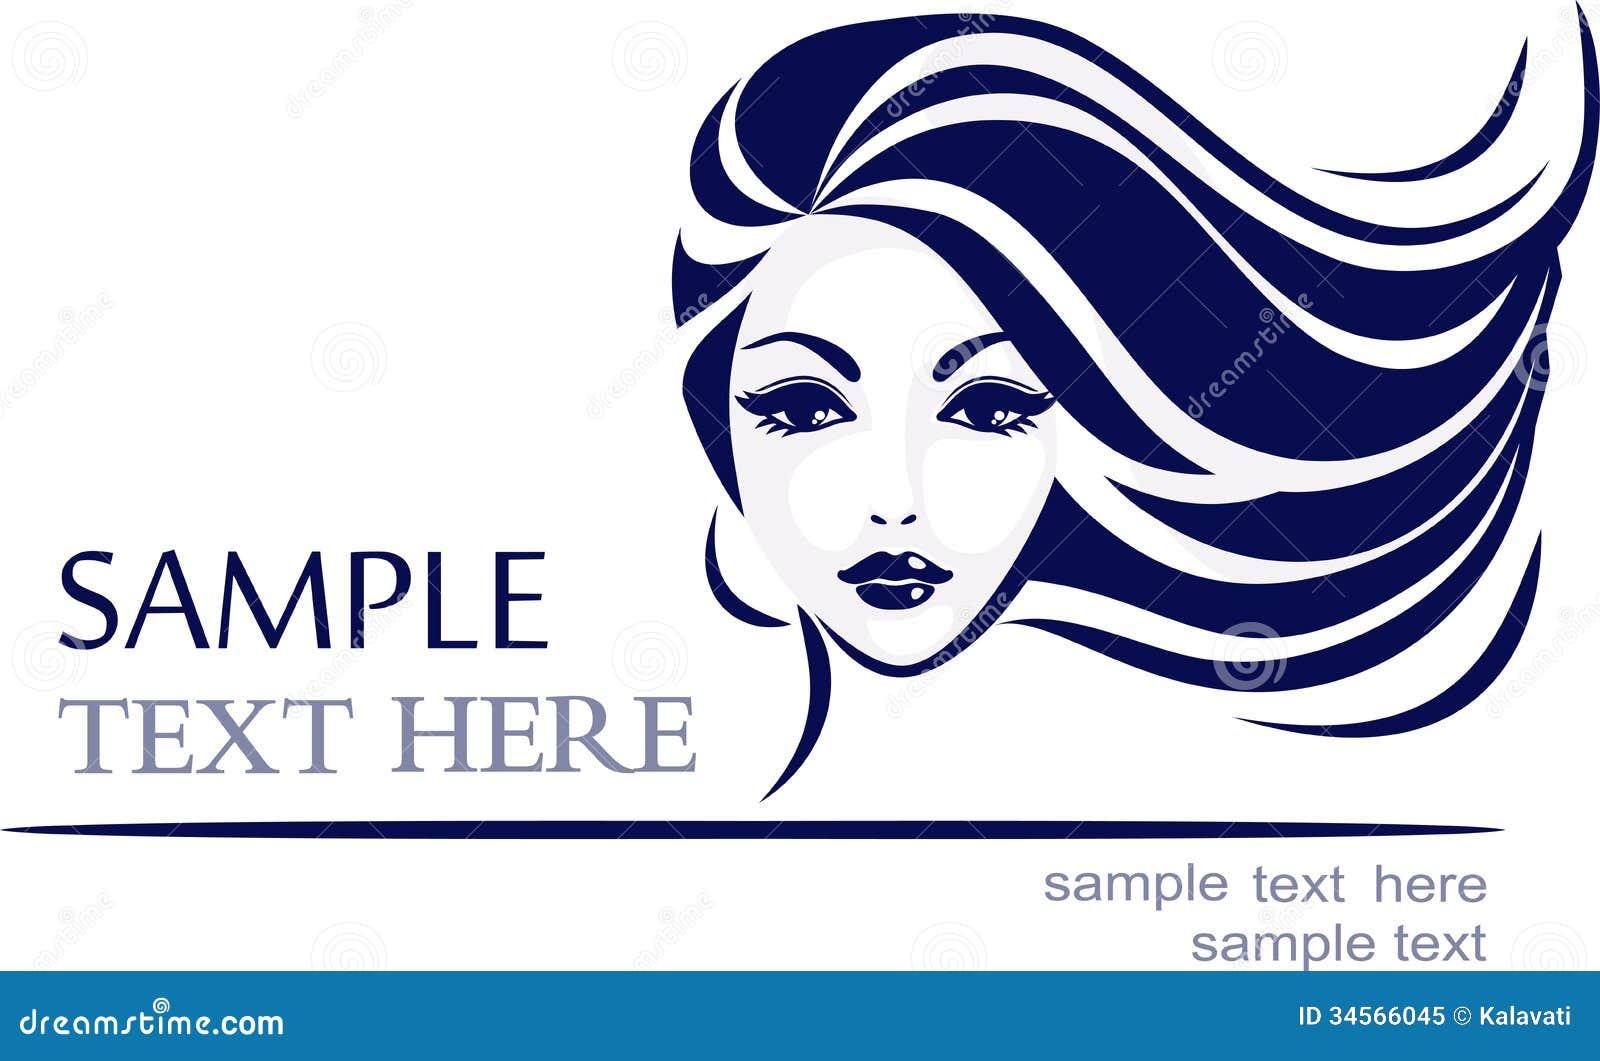 Styles Beauty Salon Logo : hnczcyw.com